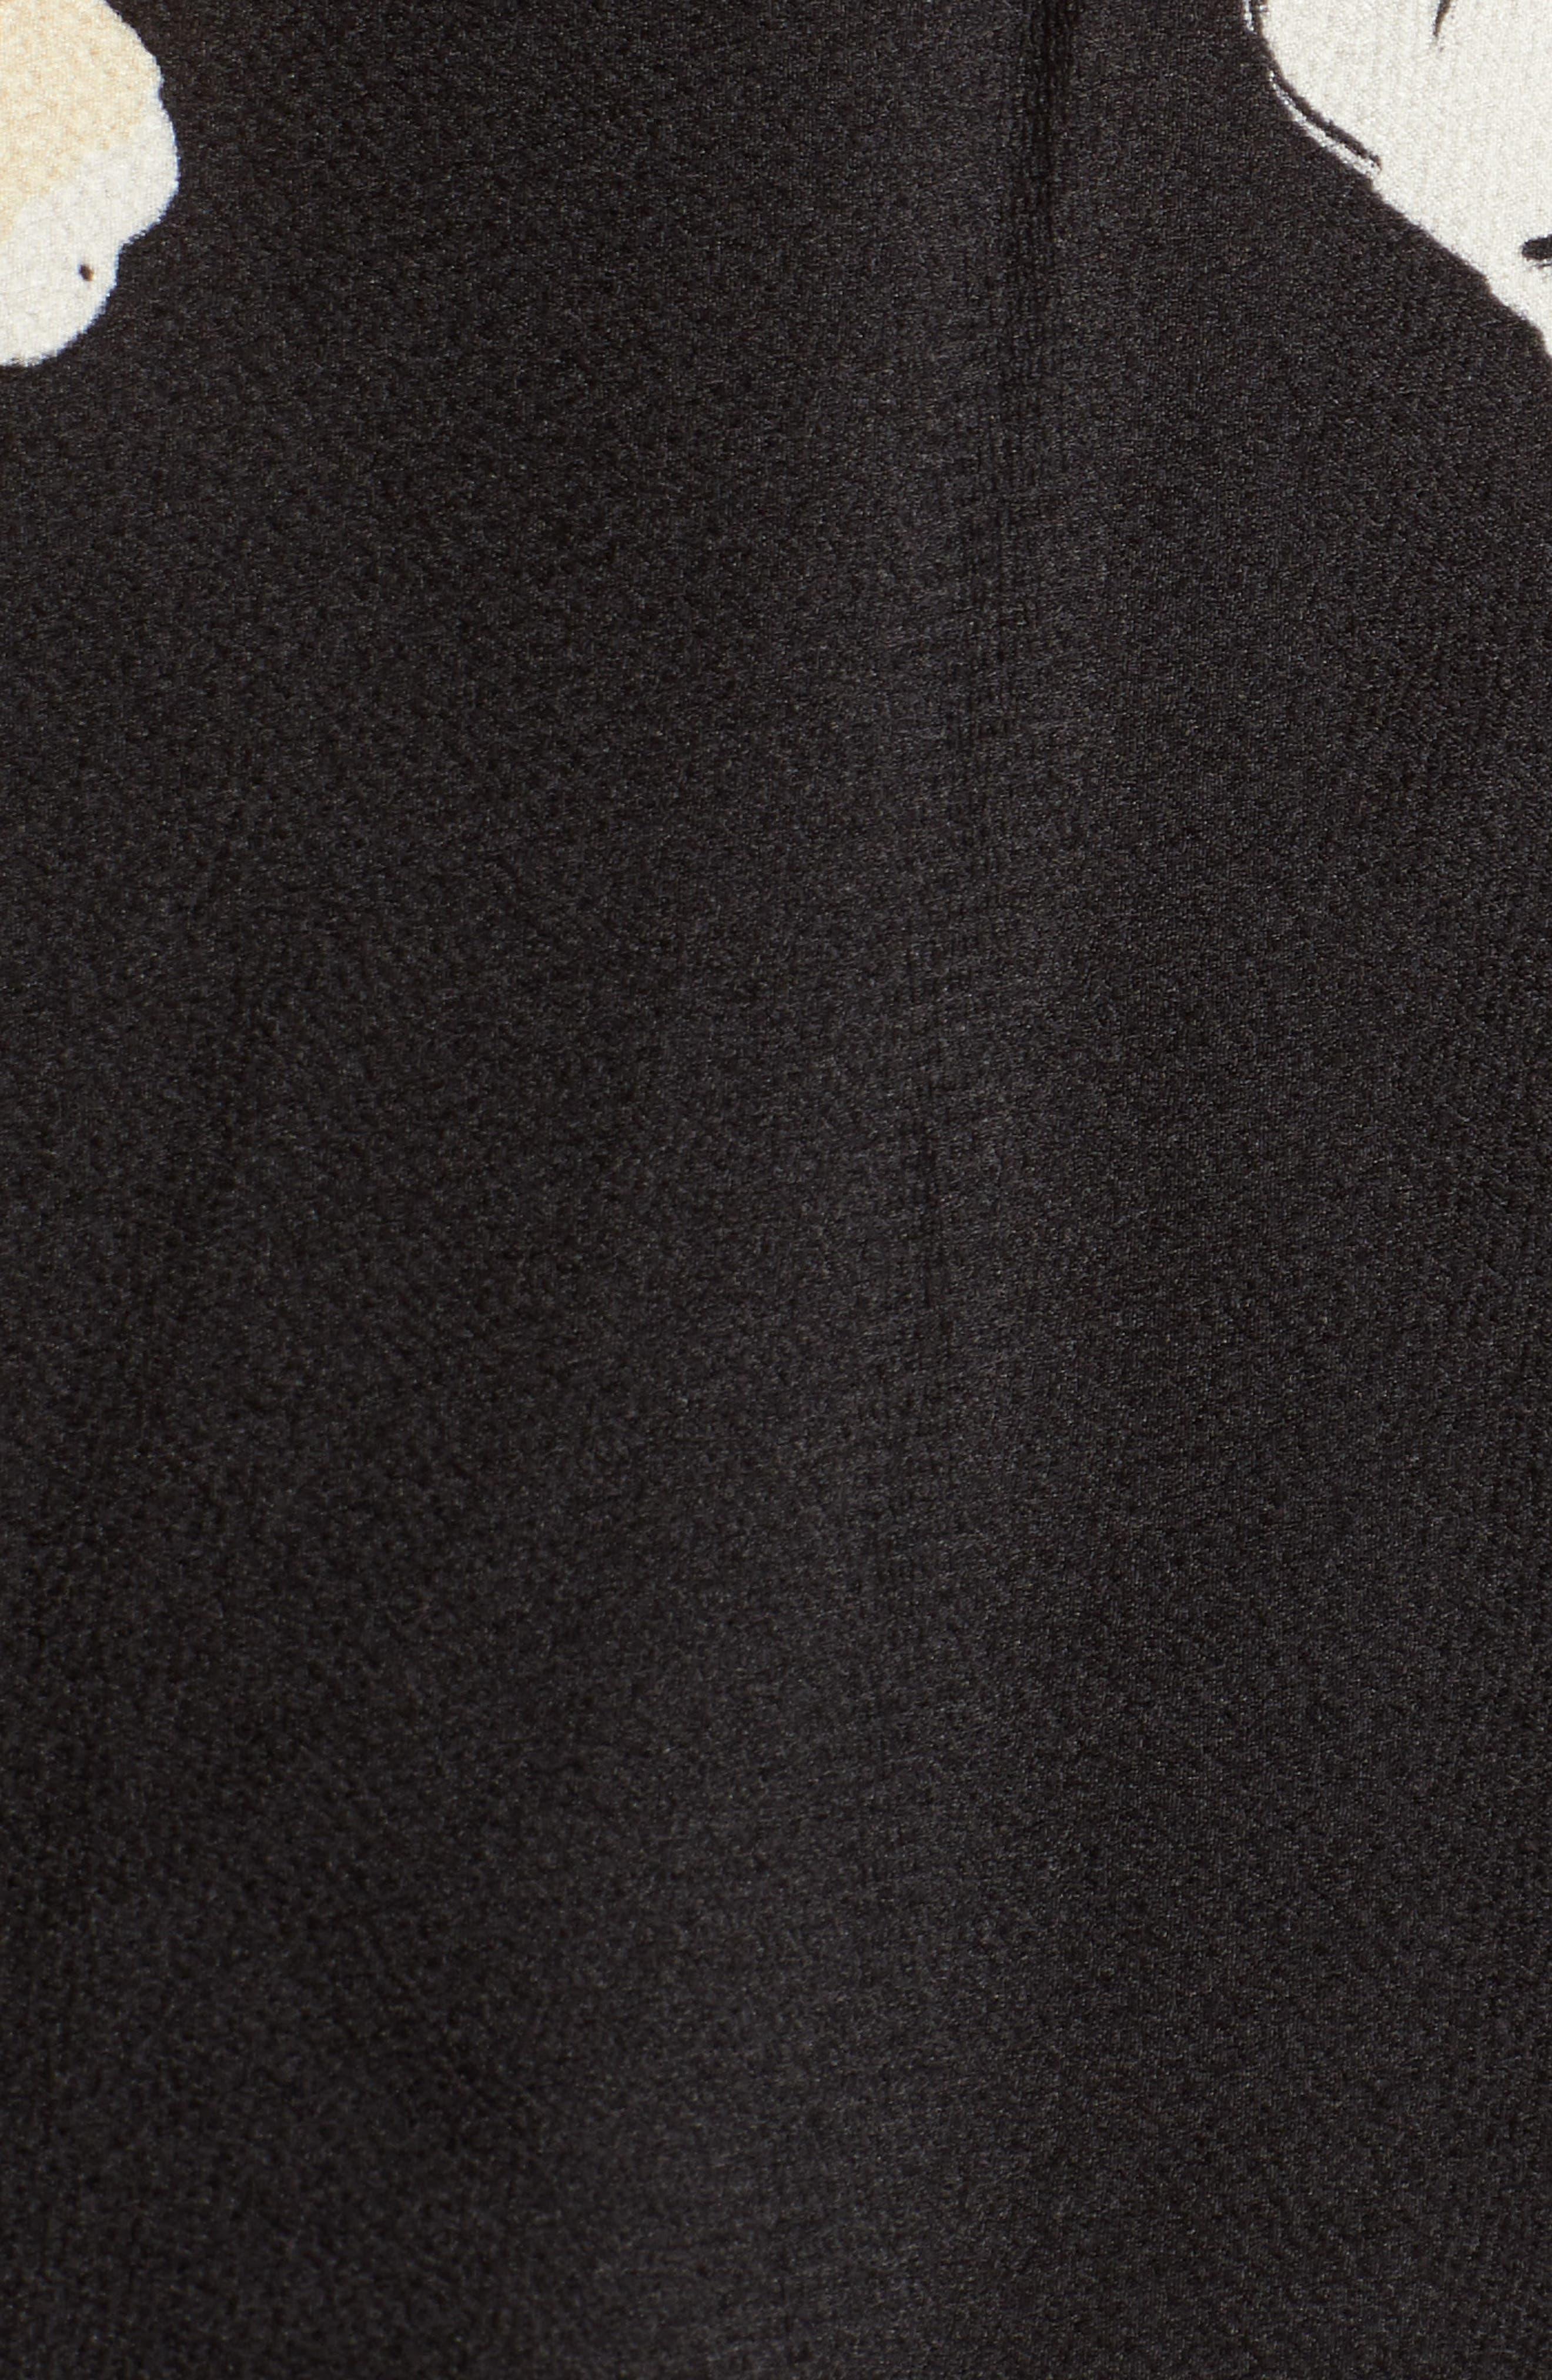 Bishop + Young Cold Shoulder Mini Dress,                             Alternate thumbnail 5, color,                             BLACK